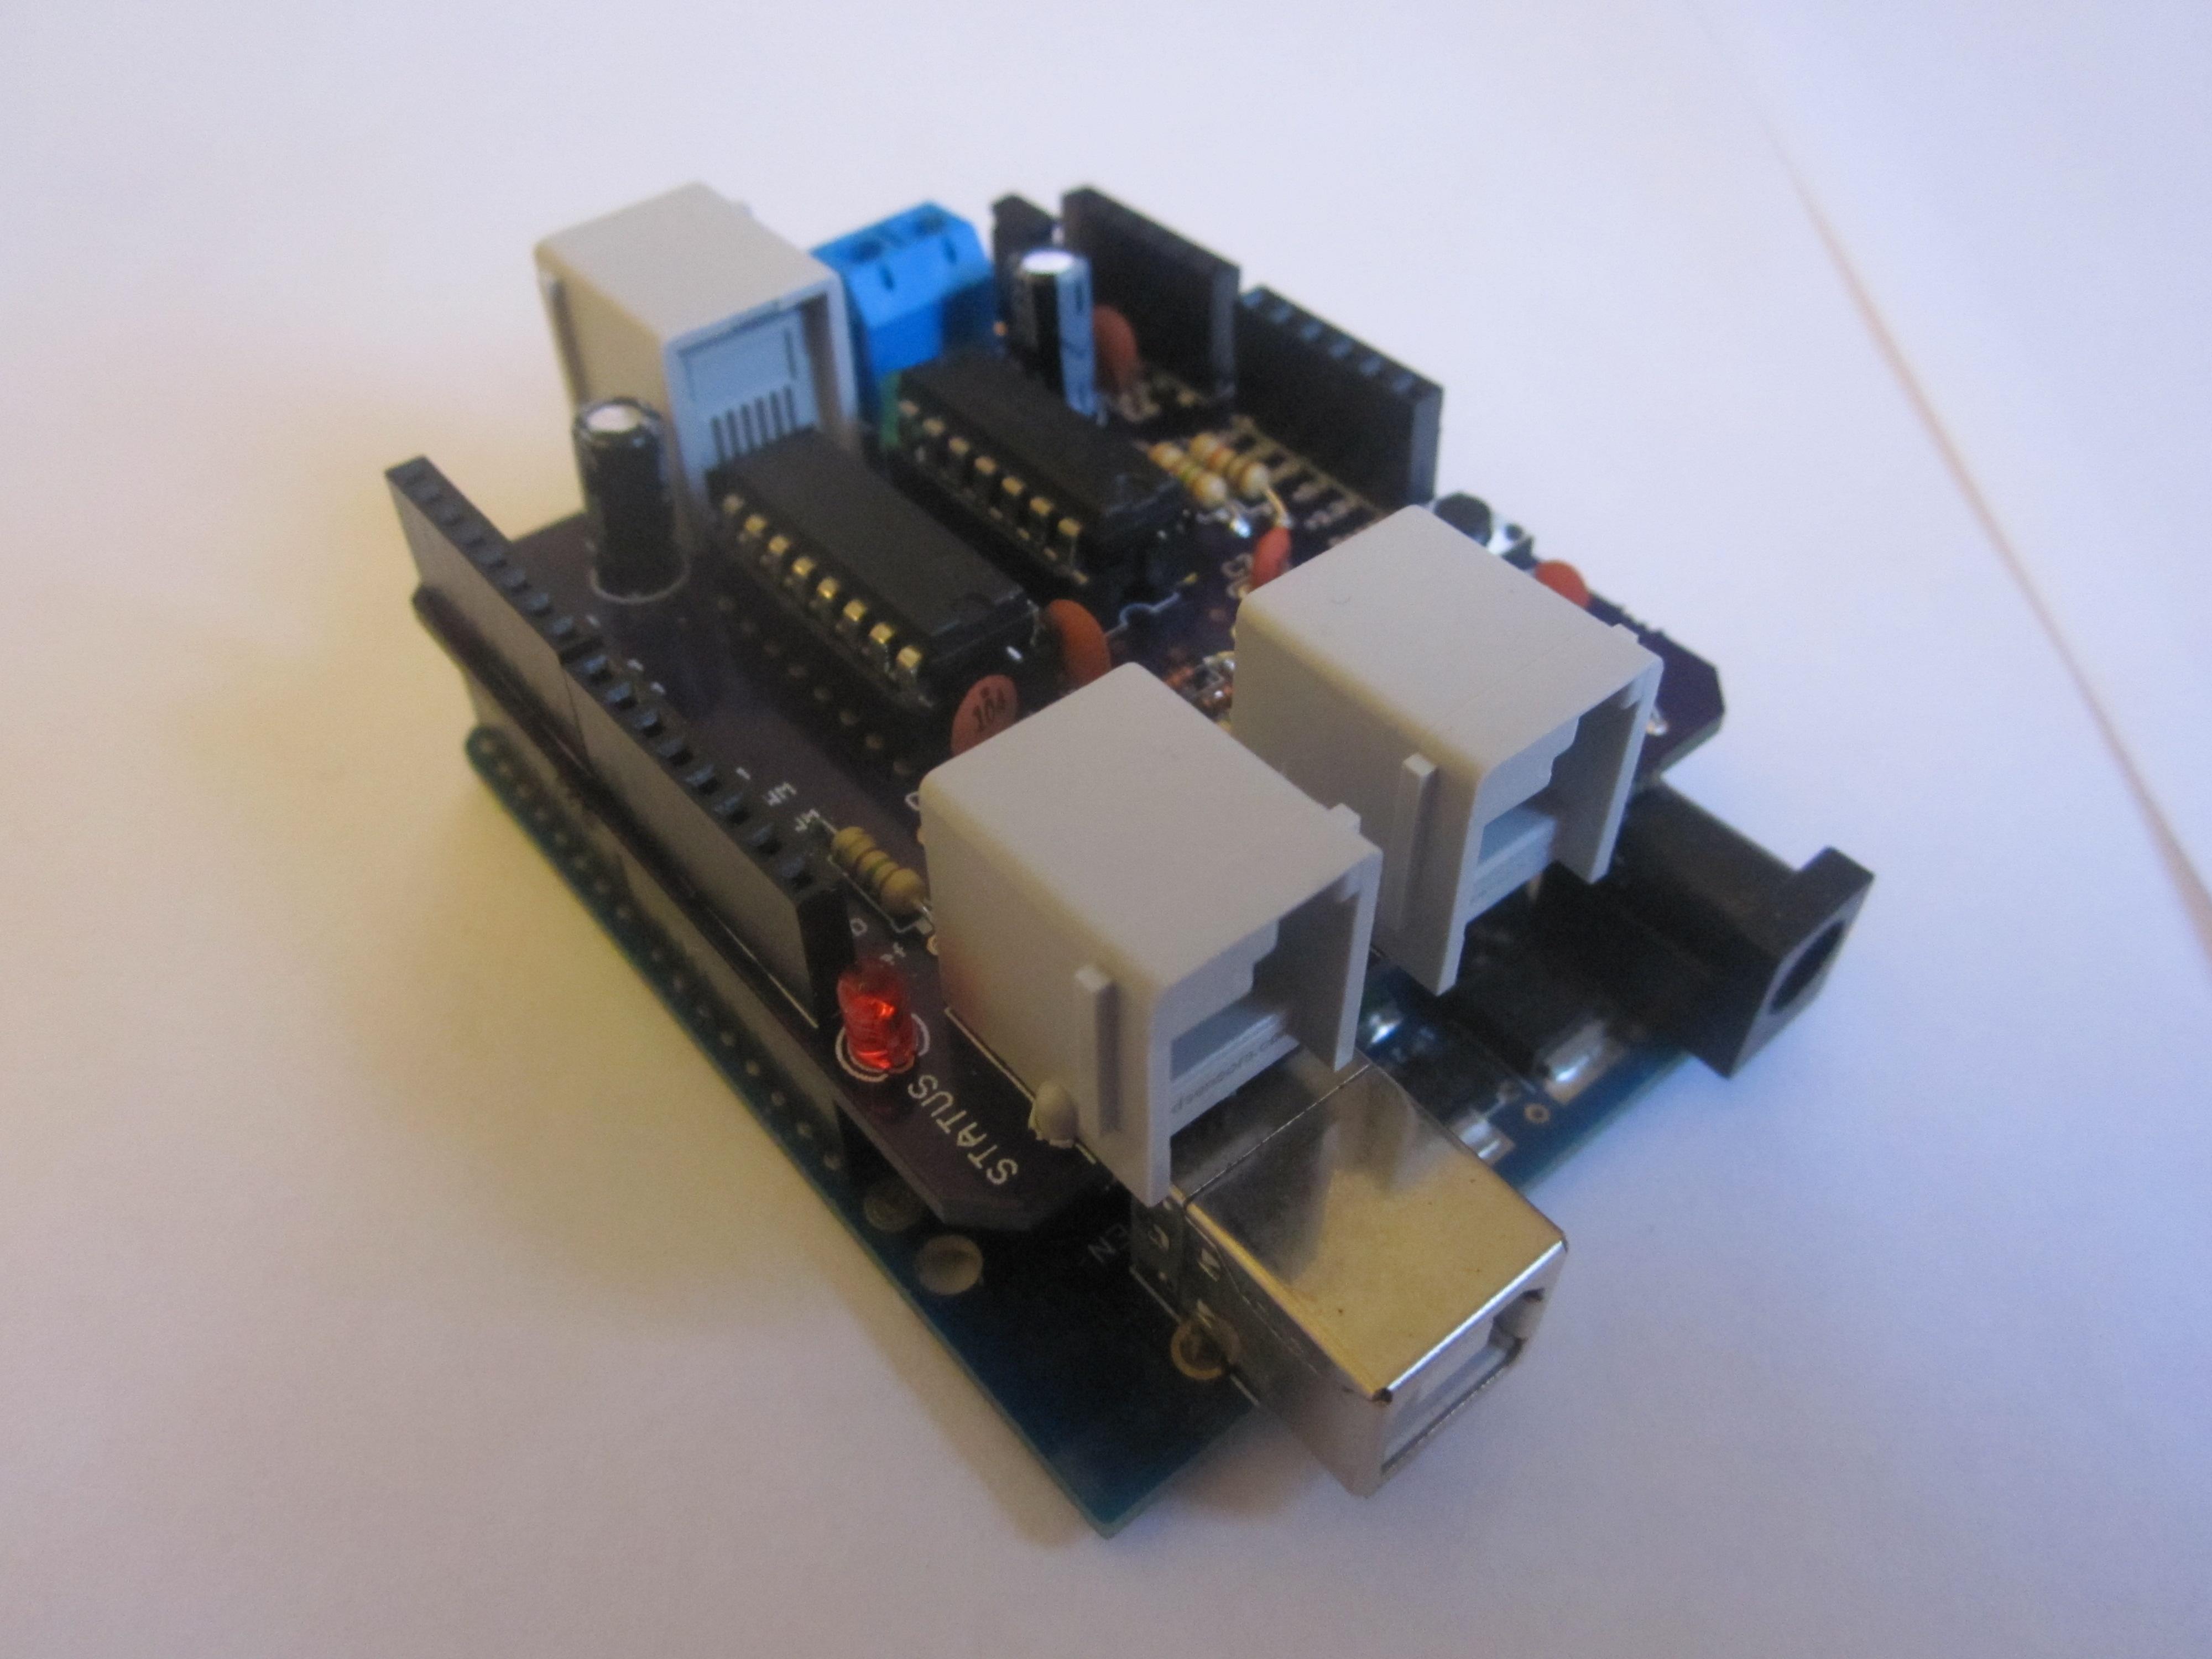 Tkj electronics nxt shield version